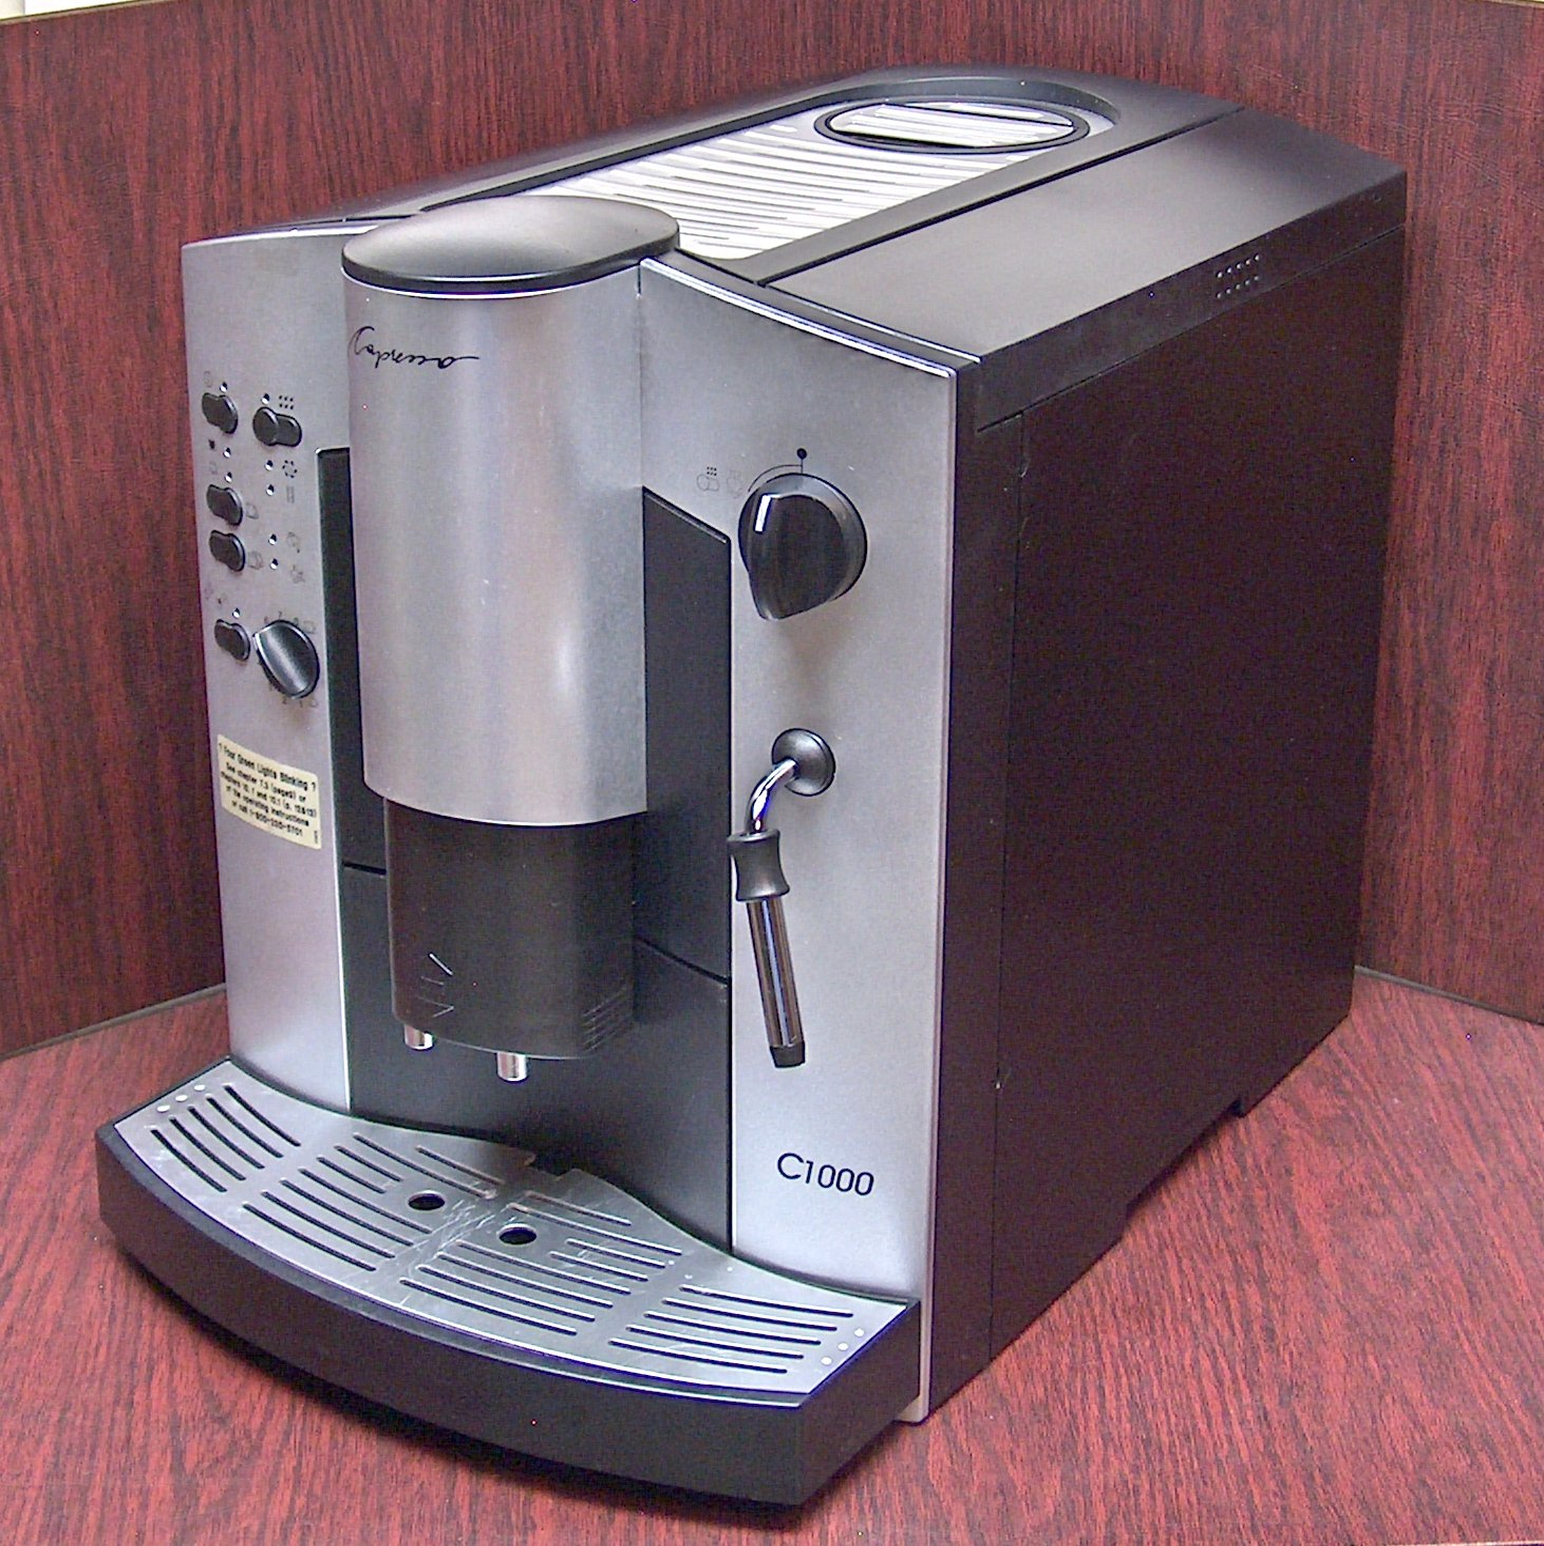 Jura-Capresso C1000 Super Automatic Espresso Machine!